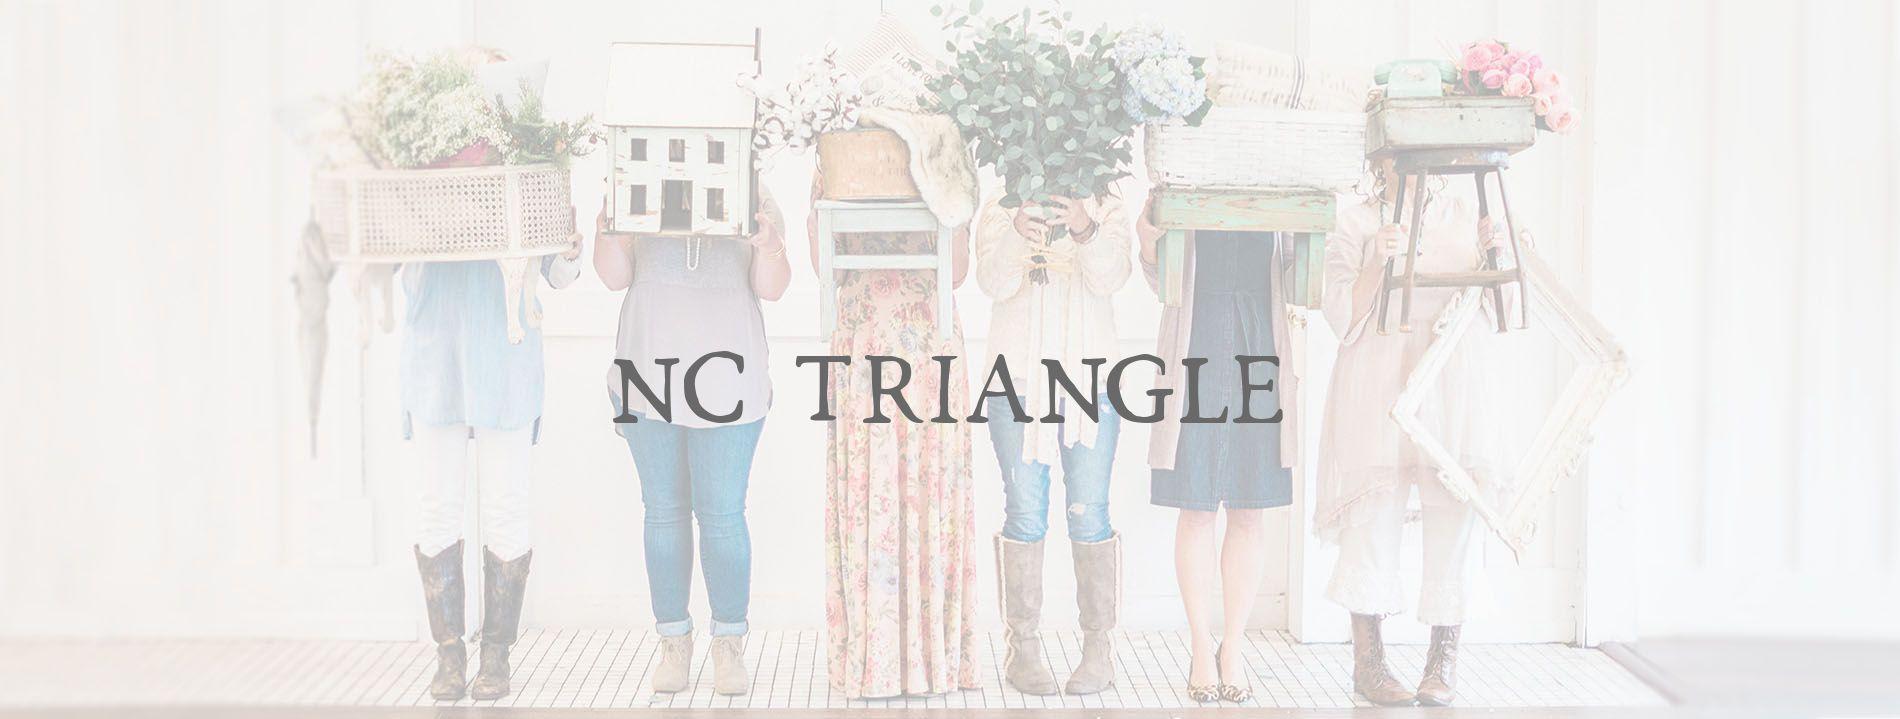 NC Triangle